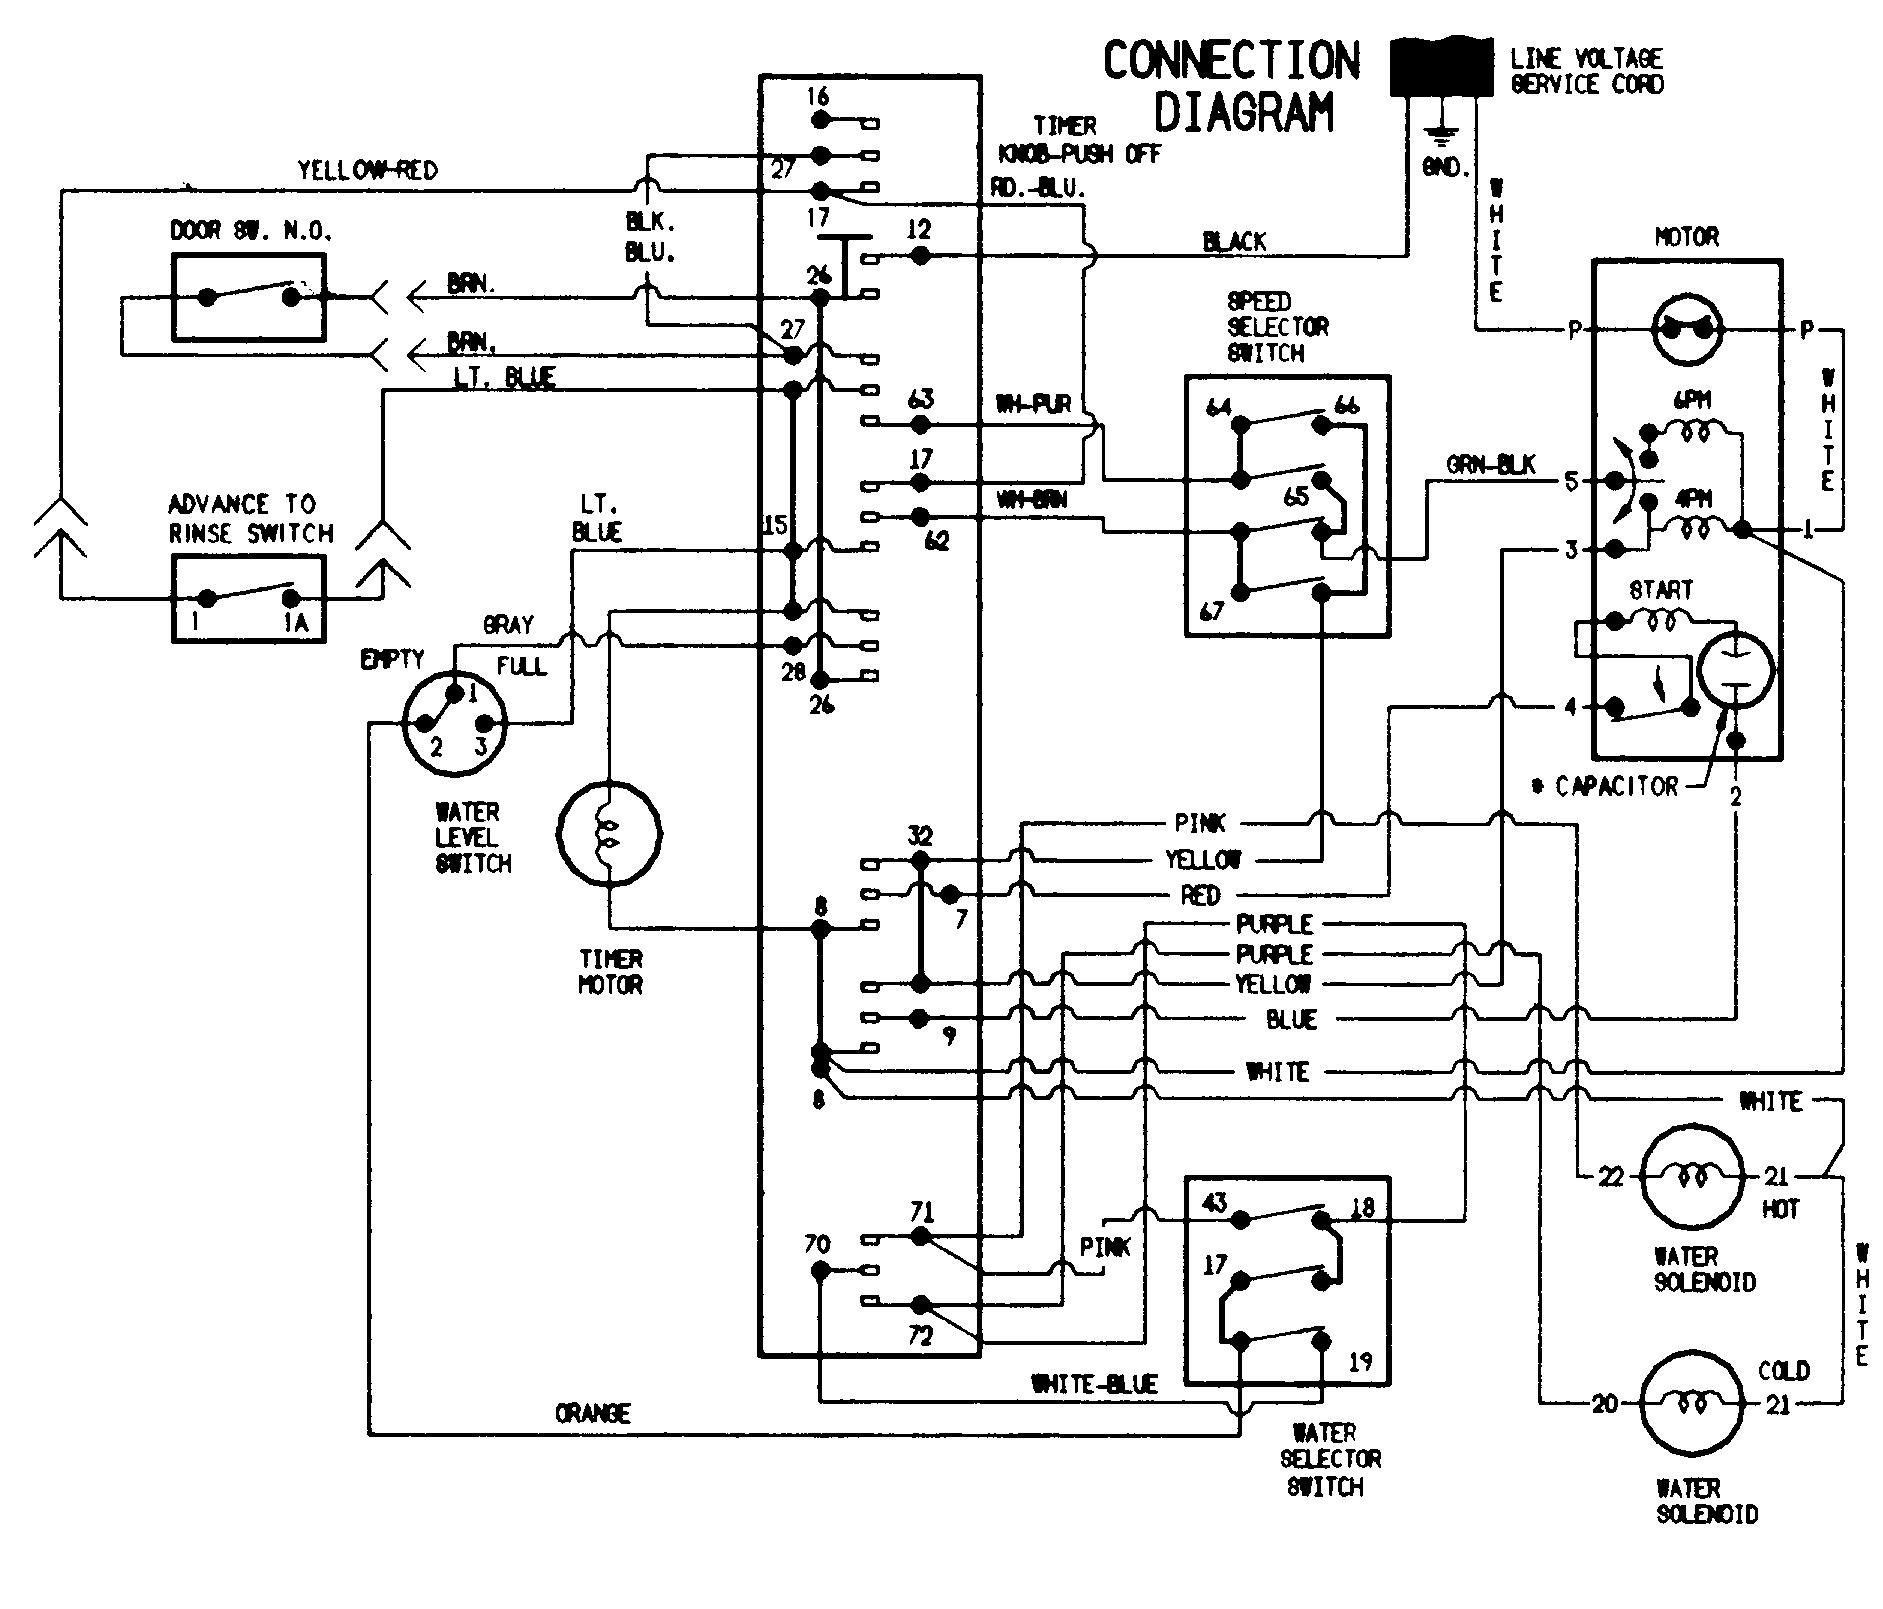 Whirlpool Duet Dryer Heating Element Wiring Diagram